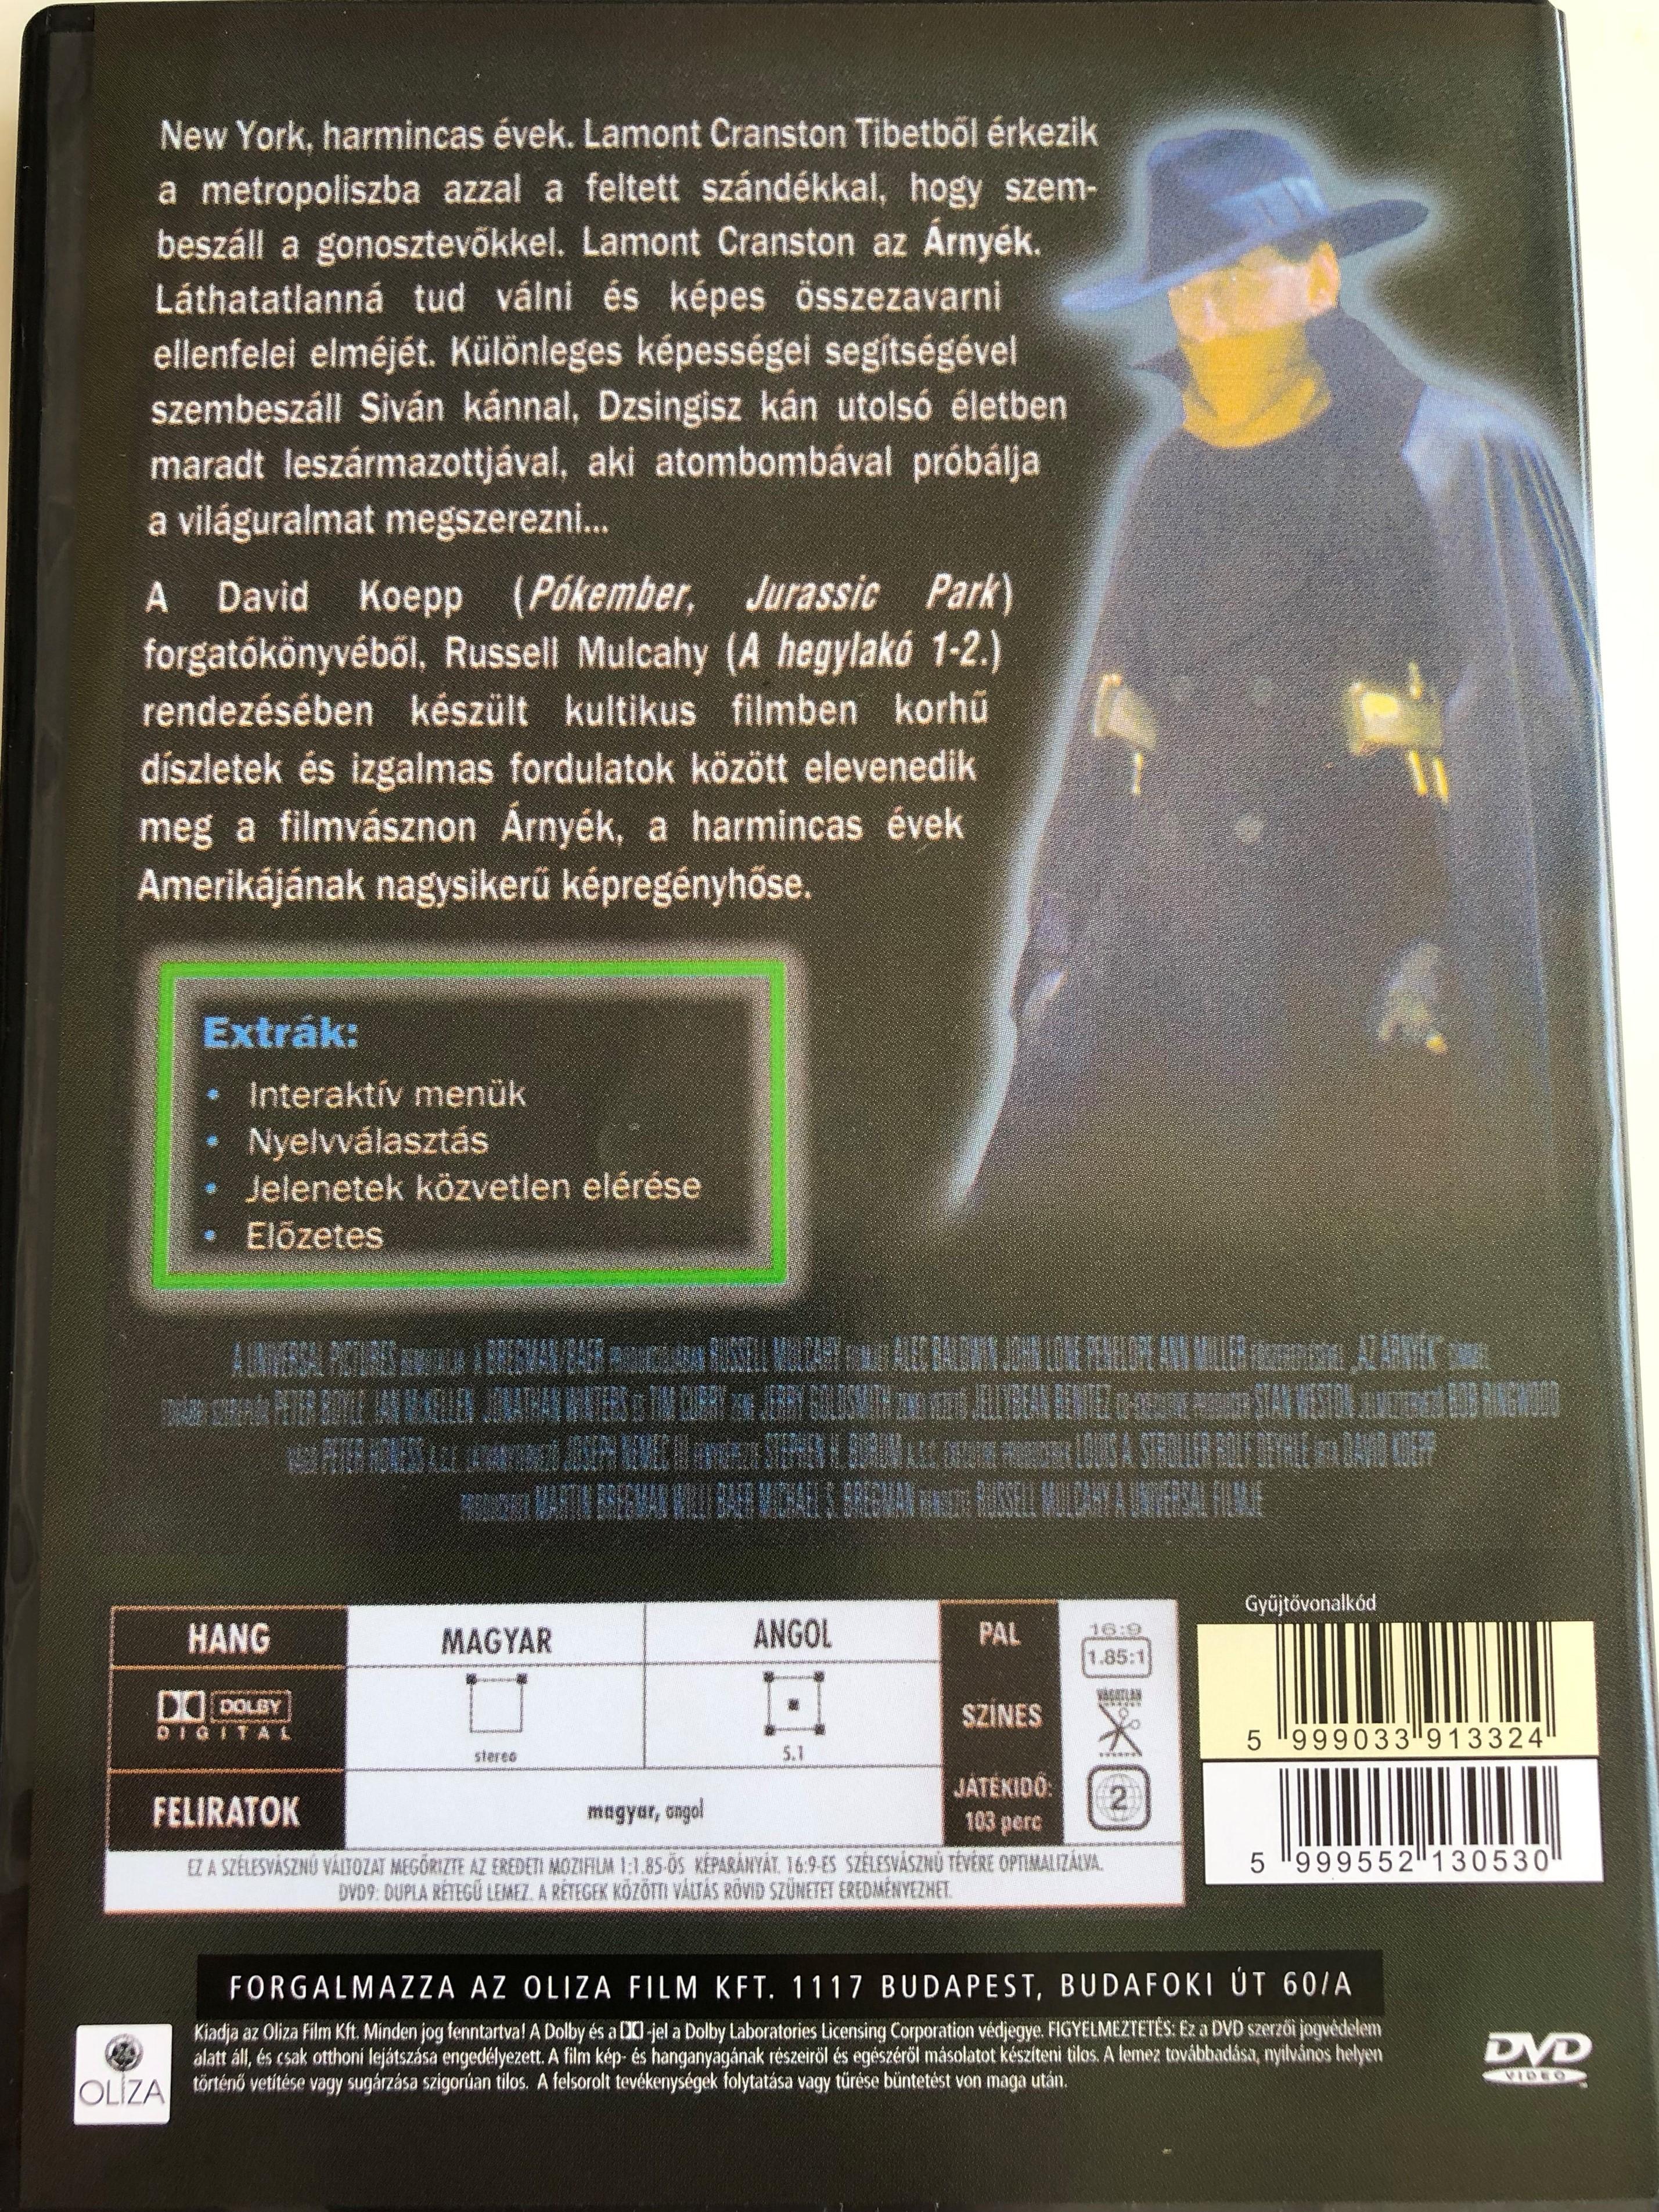 the-shadow-dvd-1994-az-rny-k-directed-by-russell-mulcahy-starring-alec-baldwin-john-lone-penelope-ann-miller-peter-boyle-ian-mckellen-jonathan-winters-tim-curry-2-.jpg